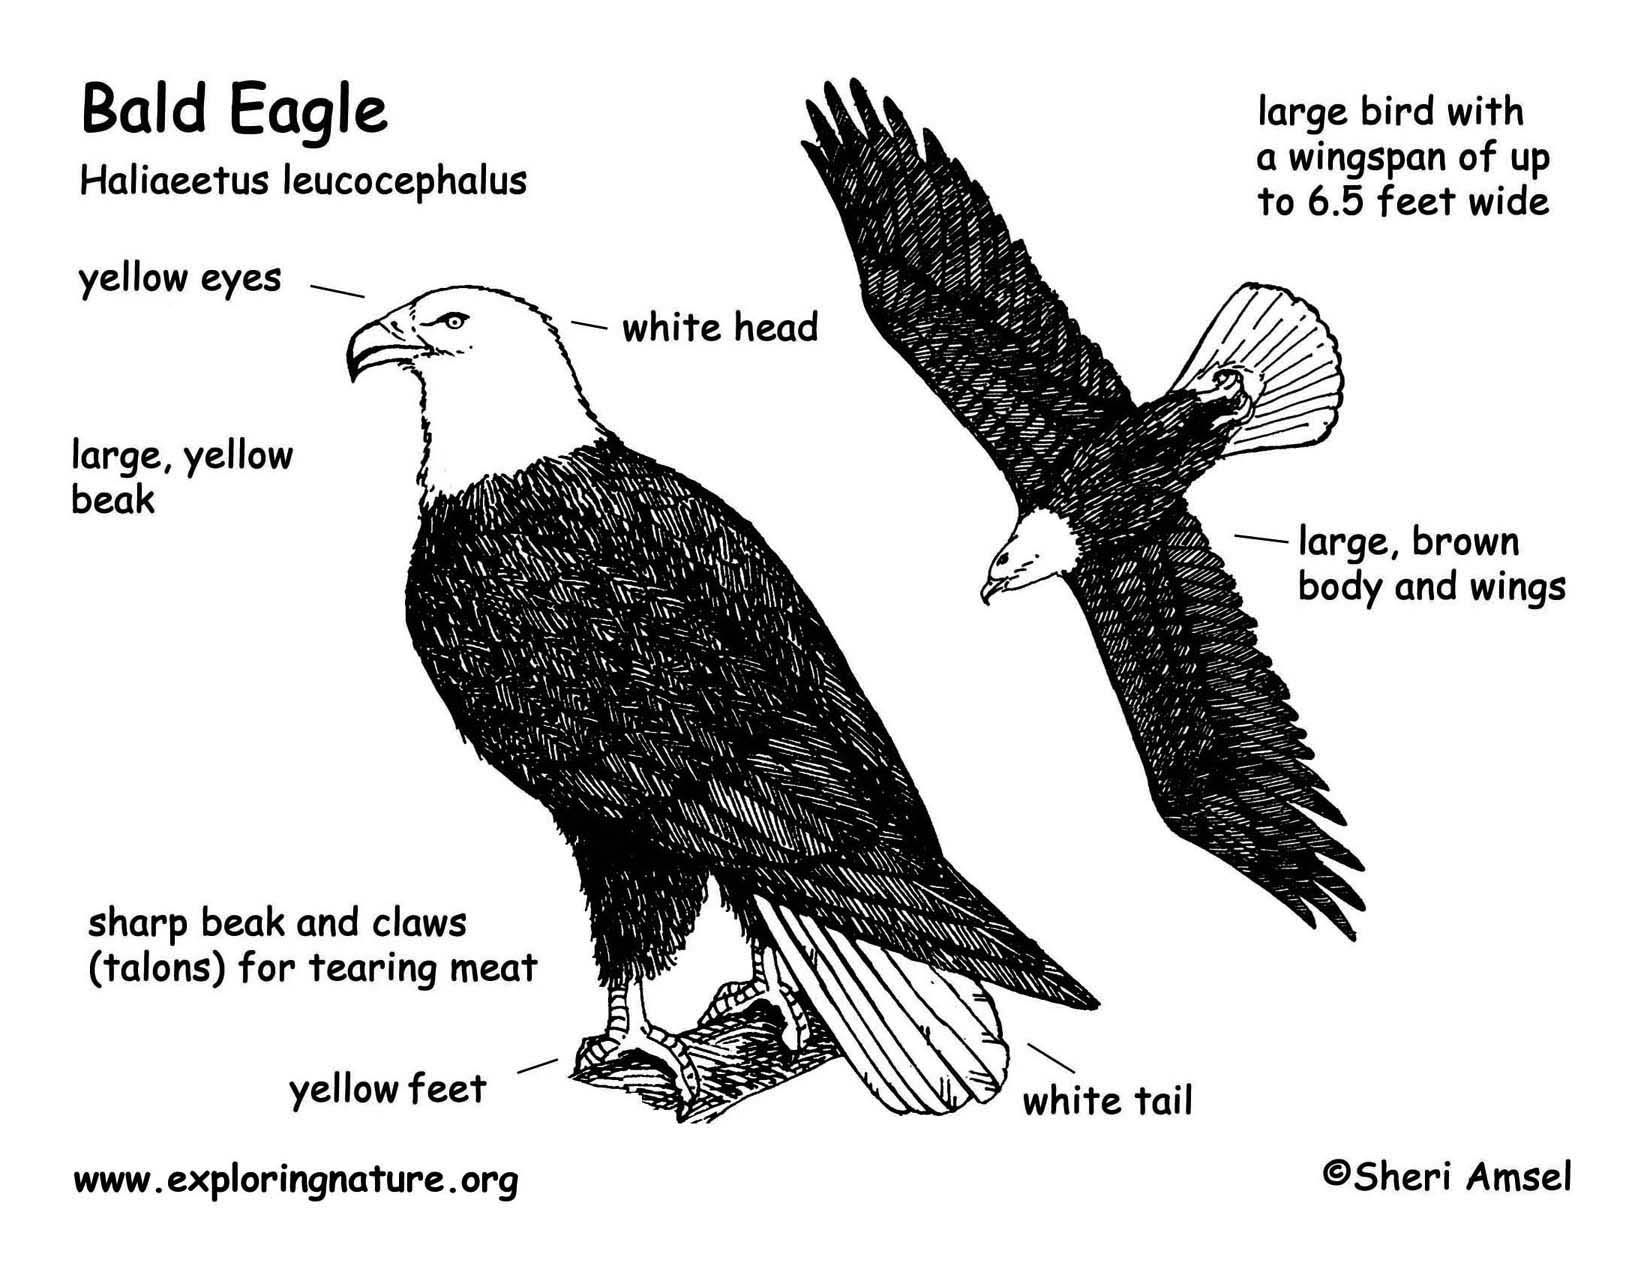 Bald Eagle Track Out Near Cape Alava On The Beach Of The